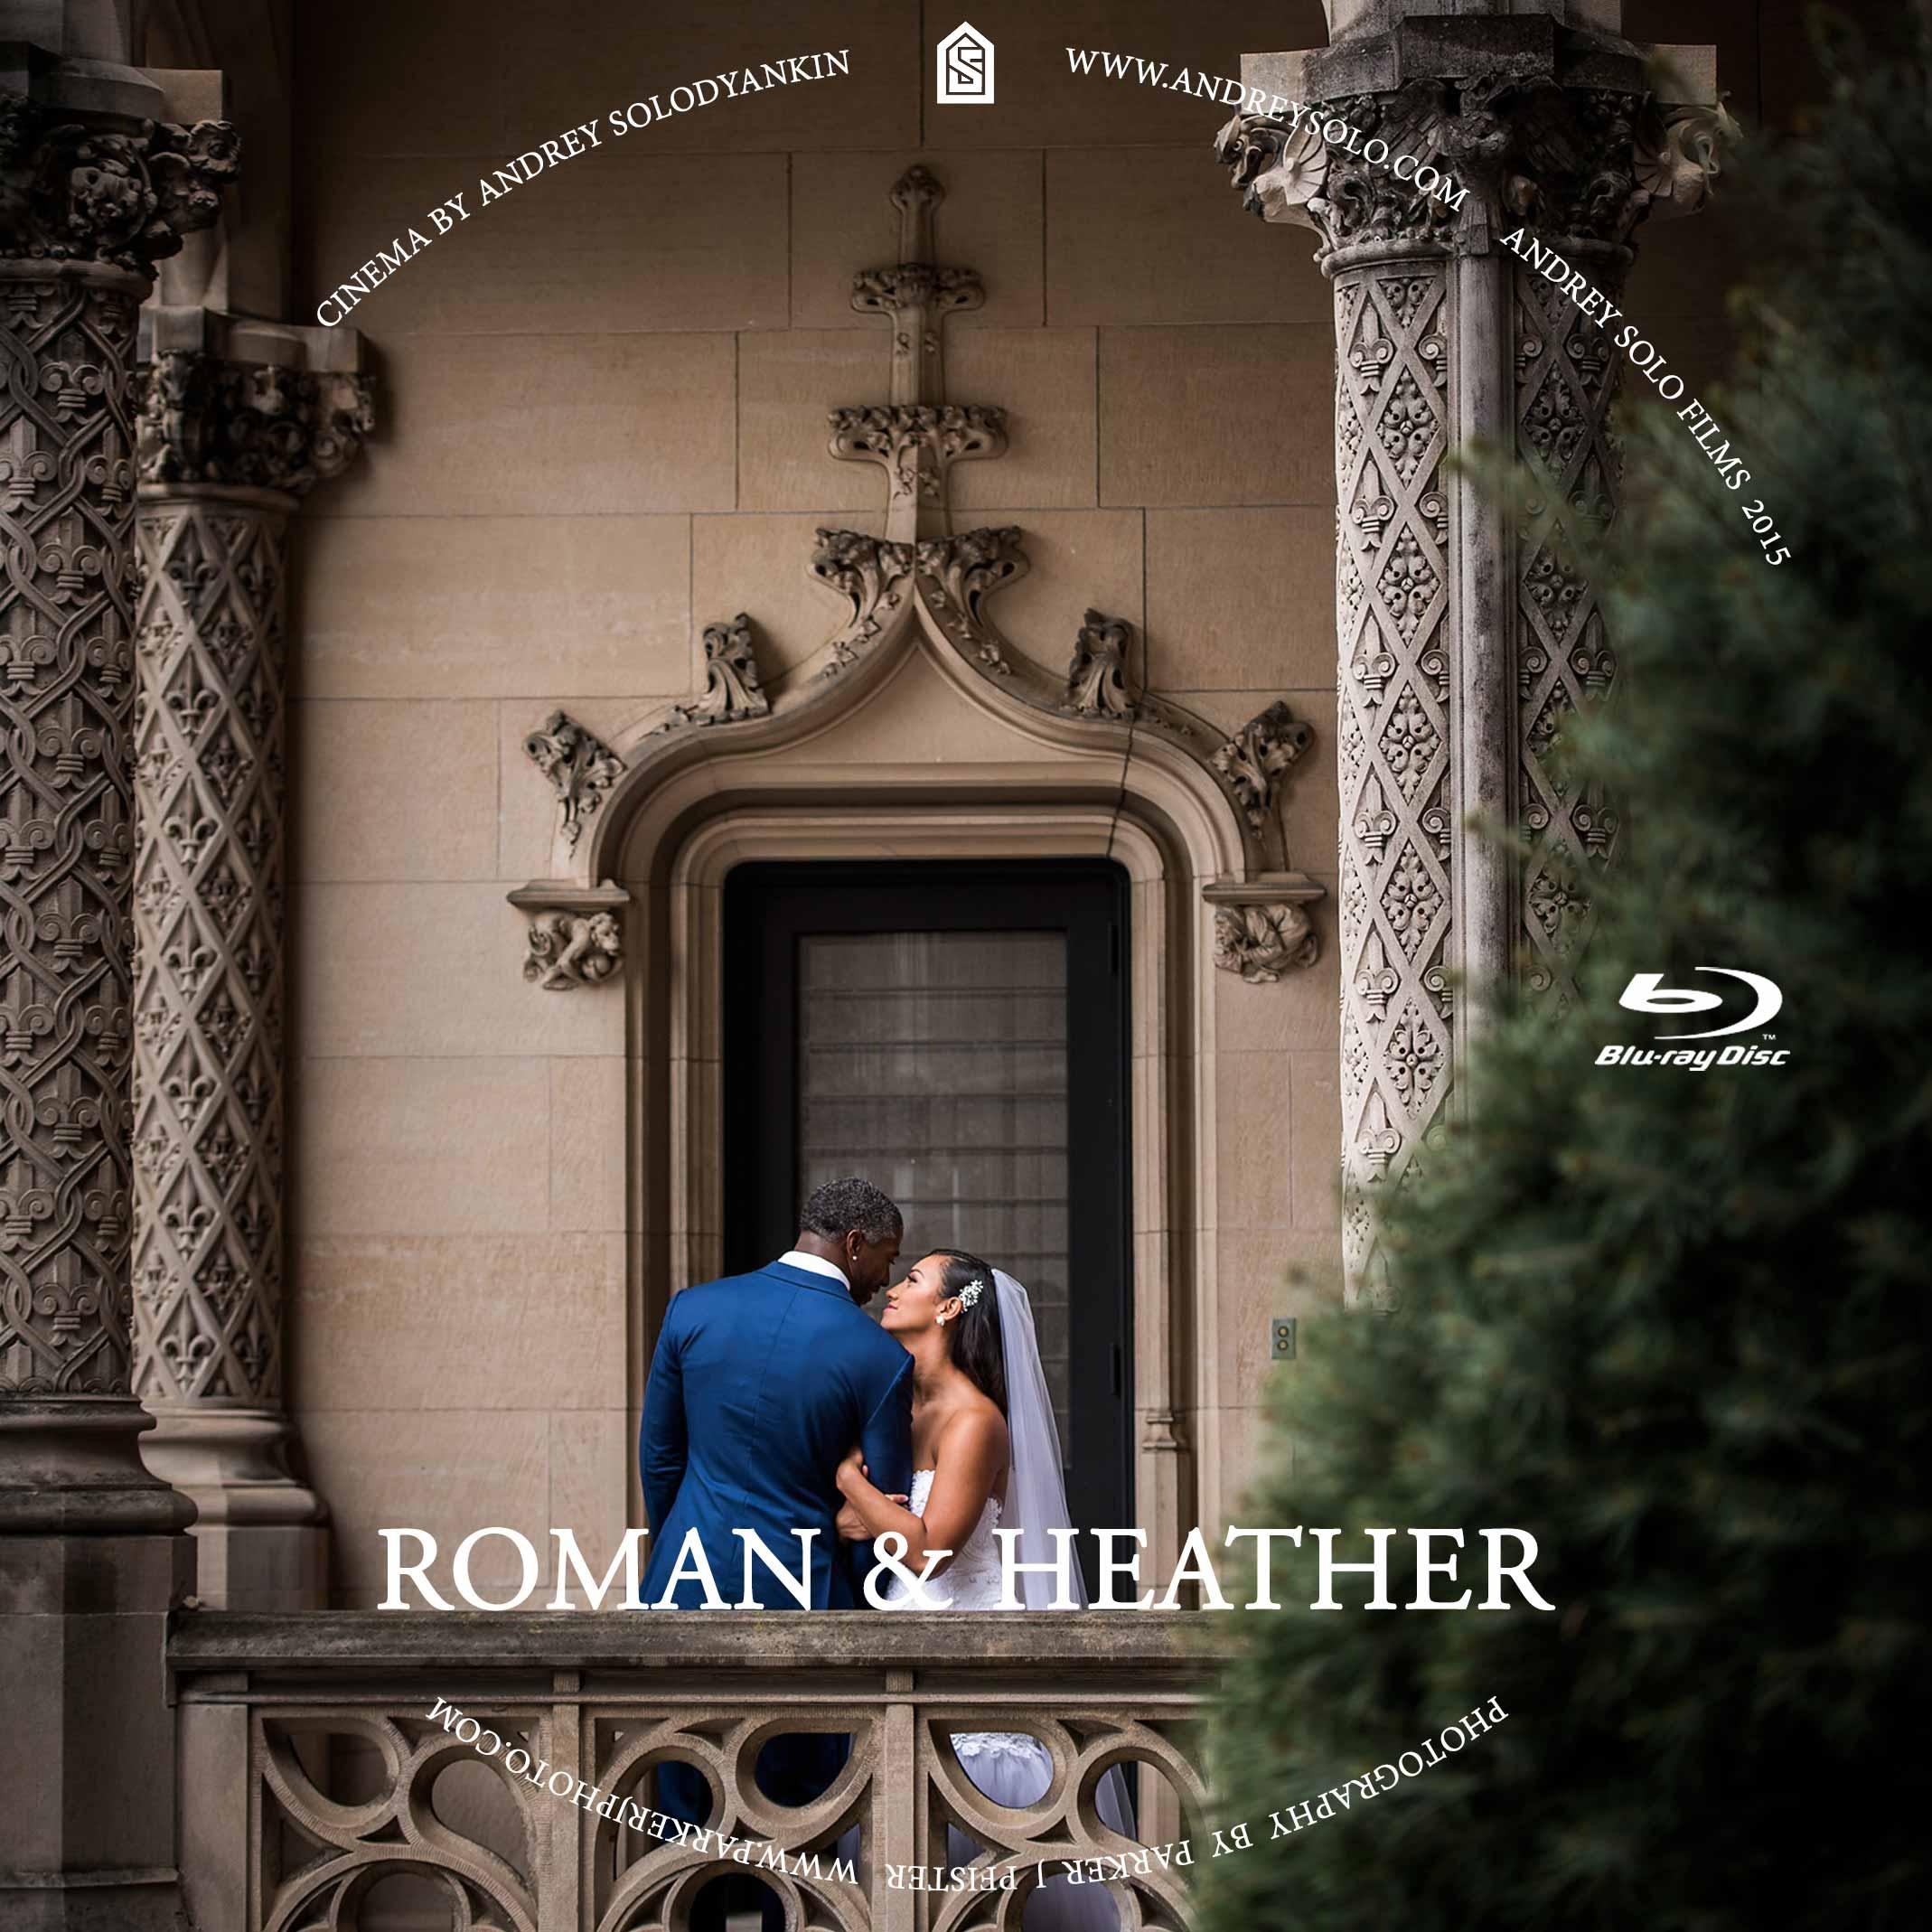 Roman-&-Heather-BluRay-Disc-Template2.jpg